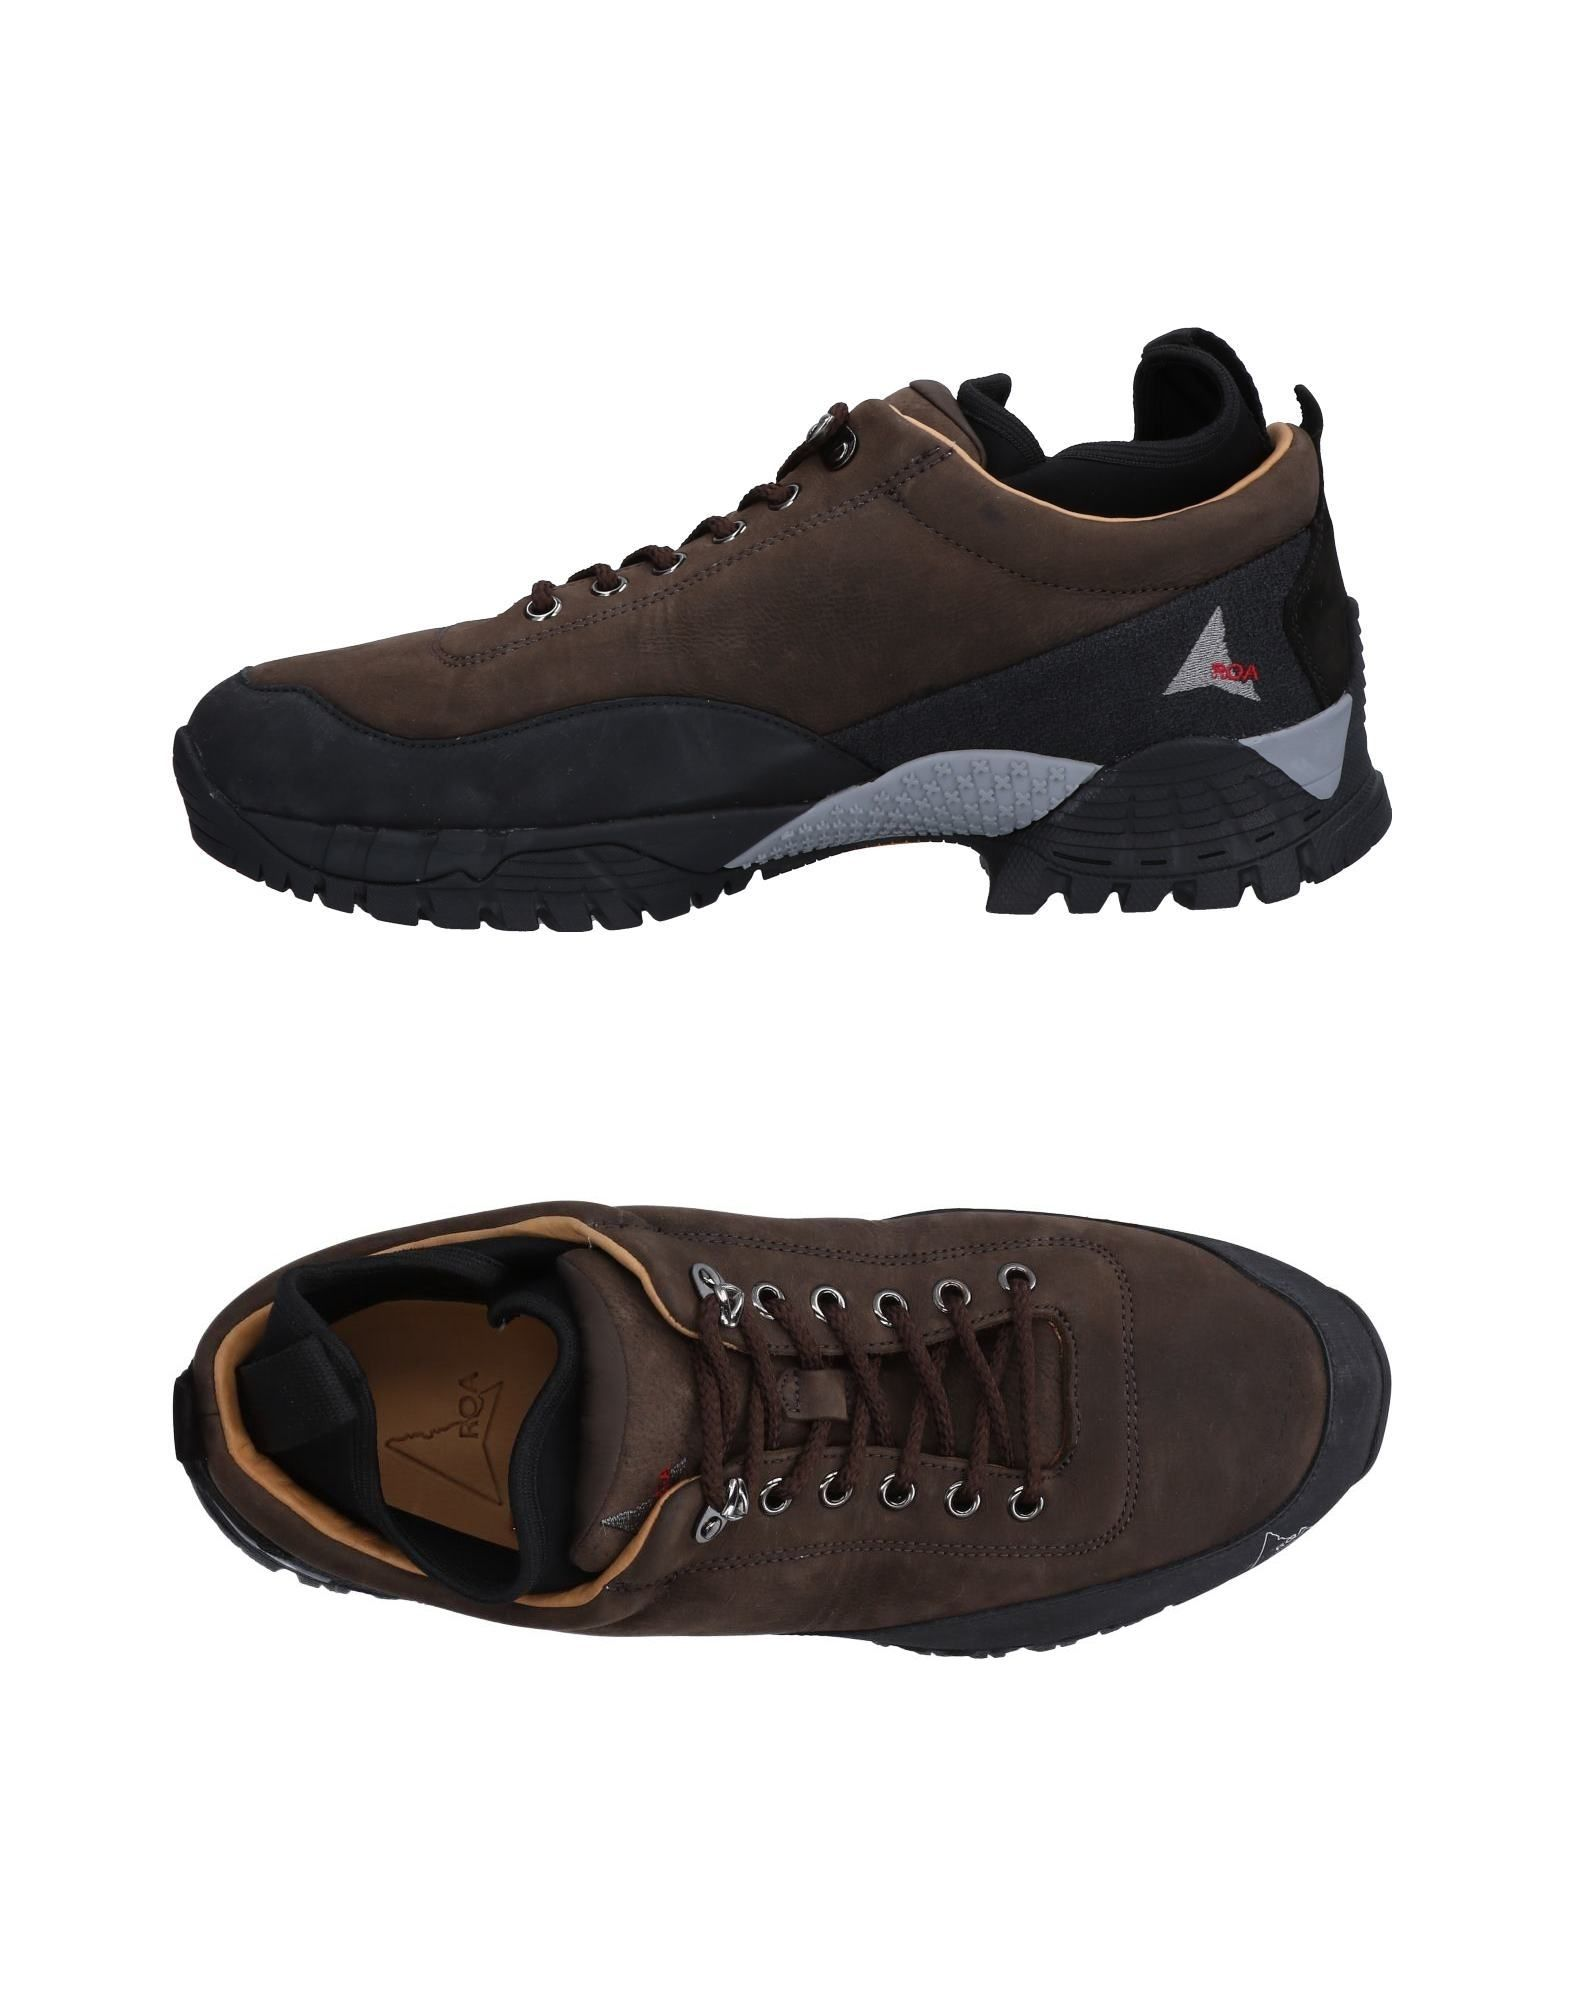 Roa 11520923EO Sneakers Herren  11520923EO Roa Gute Qualität beliebte Schuhe 0ad63f